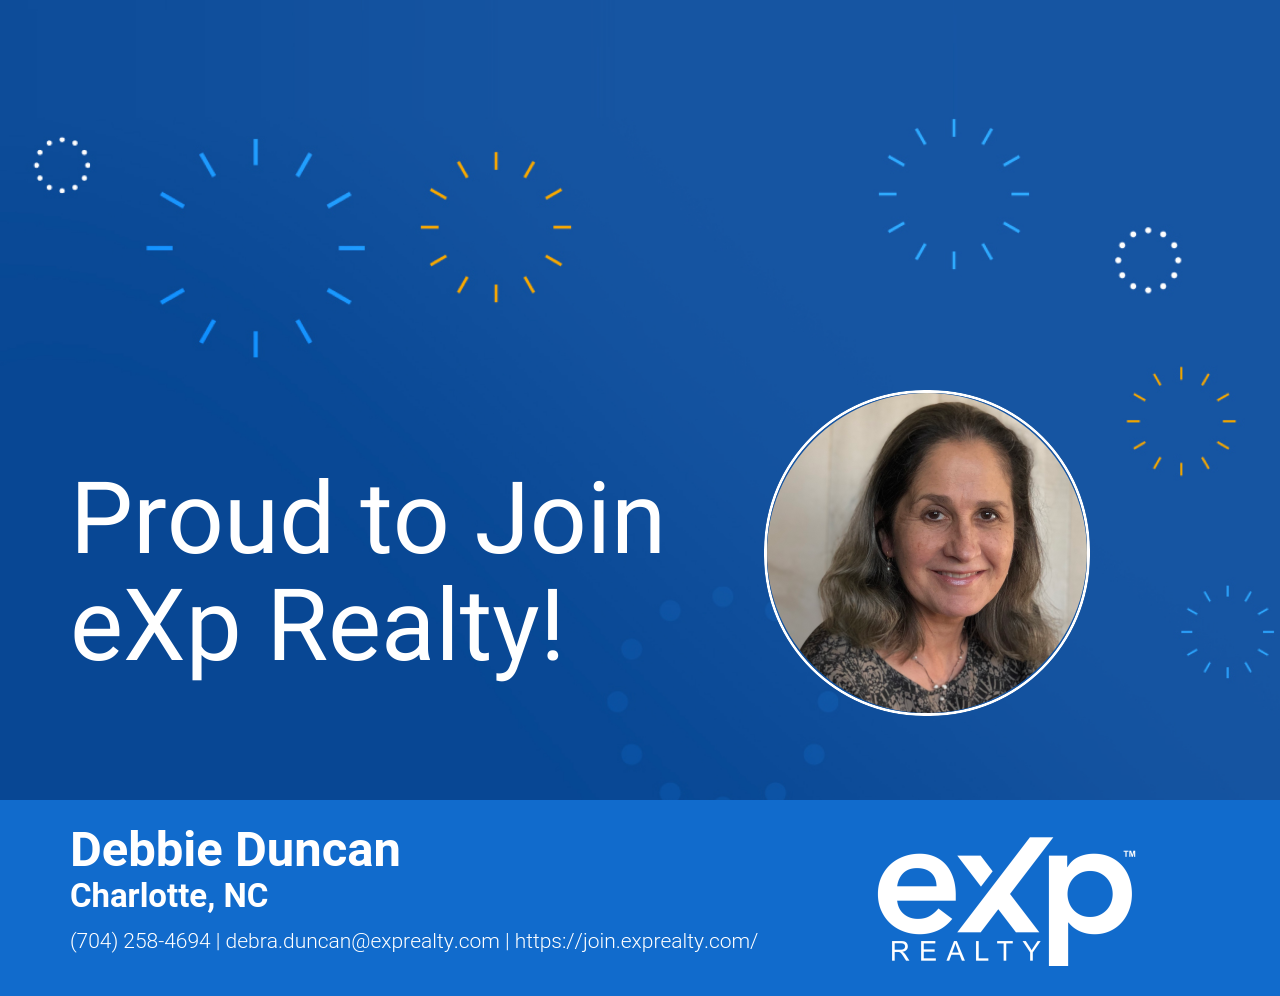 eXp Realty Welcomes Debbie Duncan!